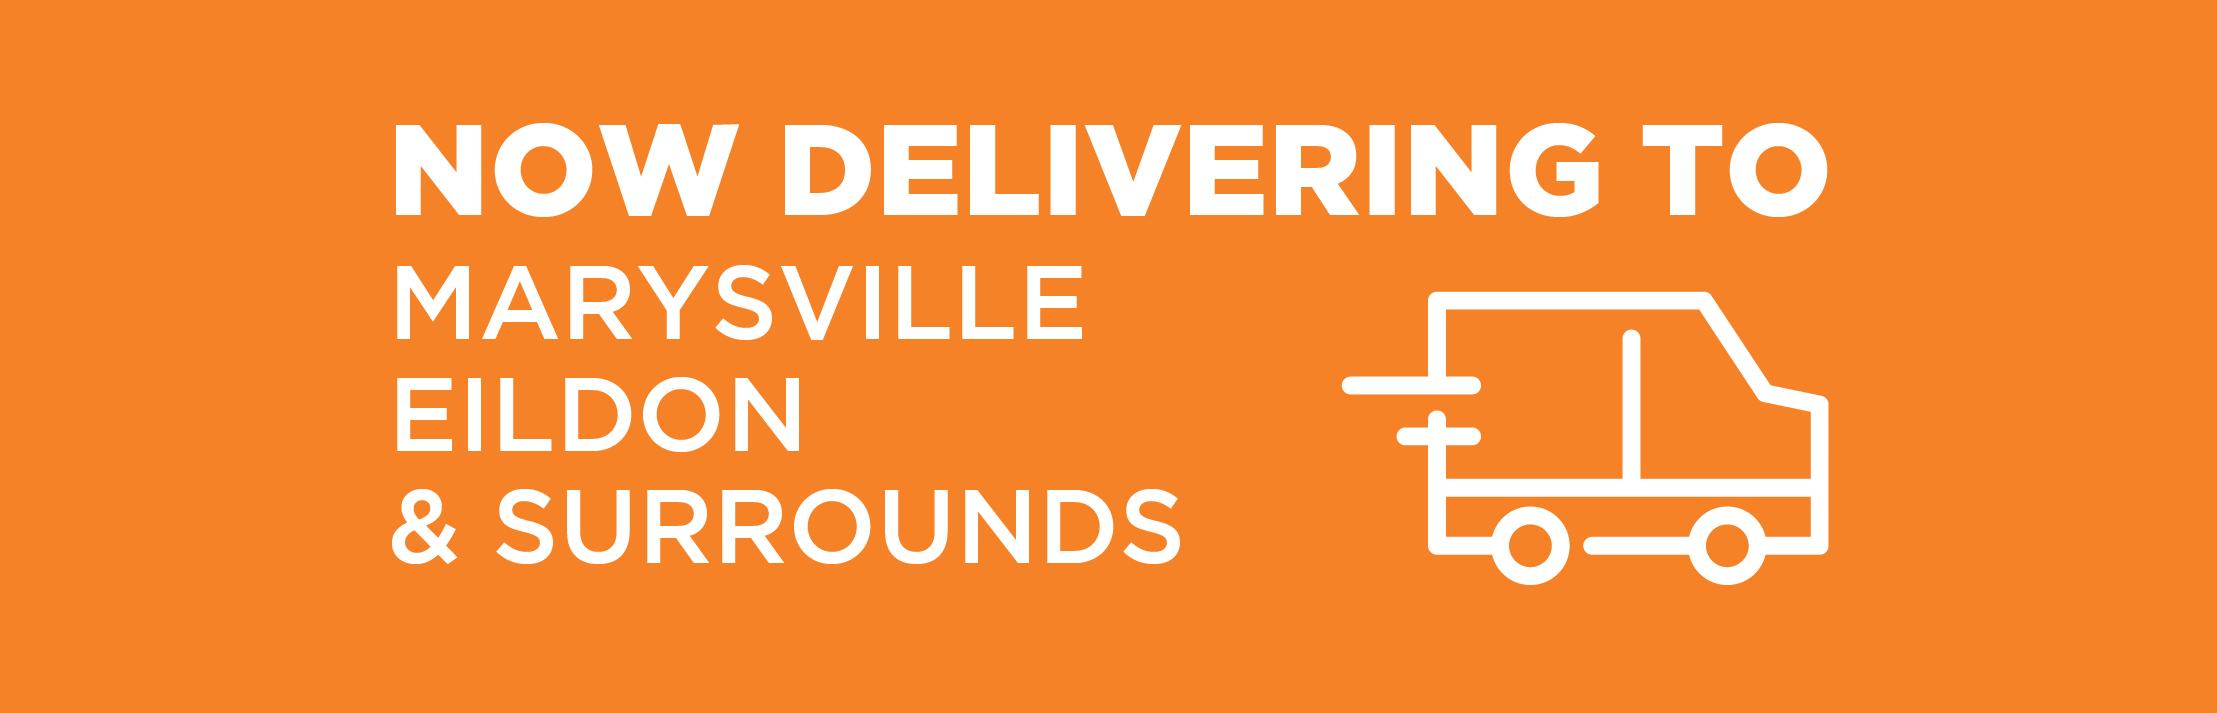 Delivery to Alexandra, Eildon & Marysville